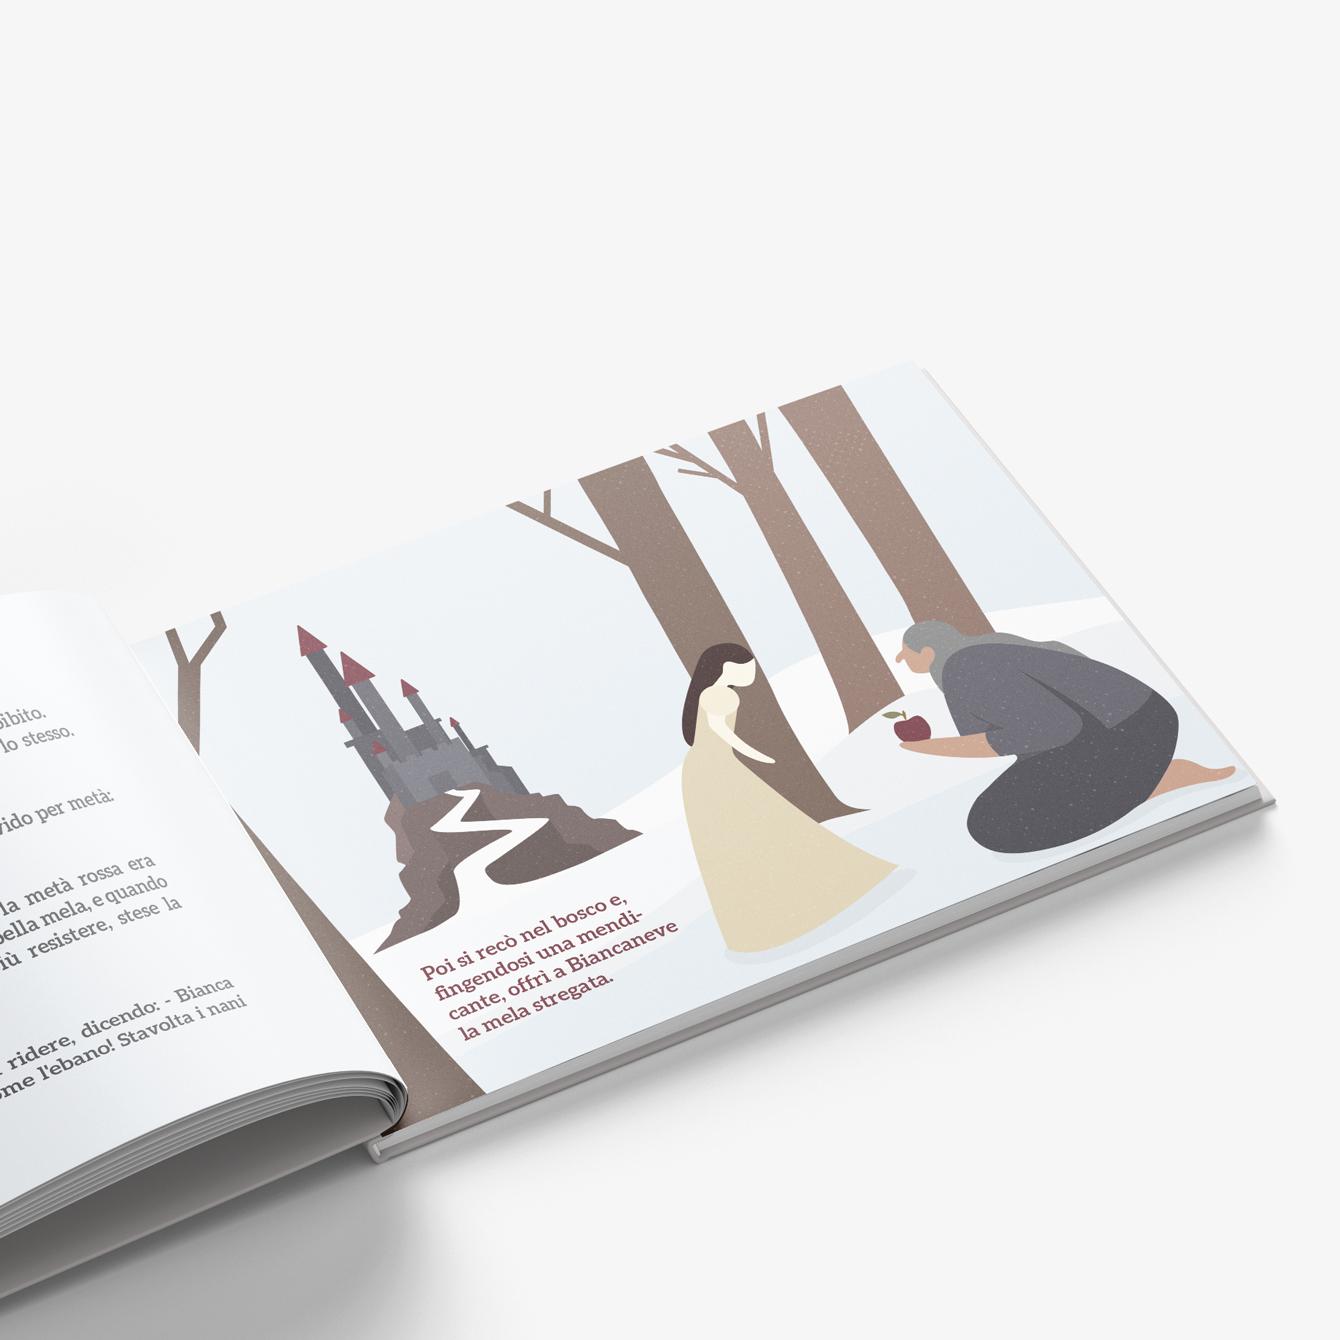 Snow White's book 2